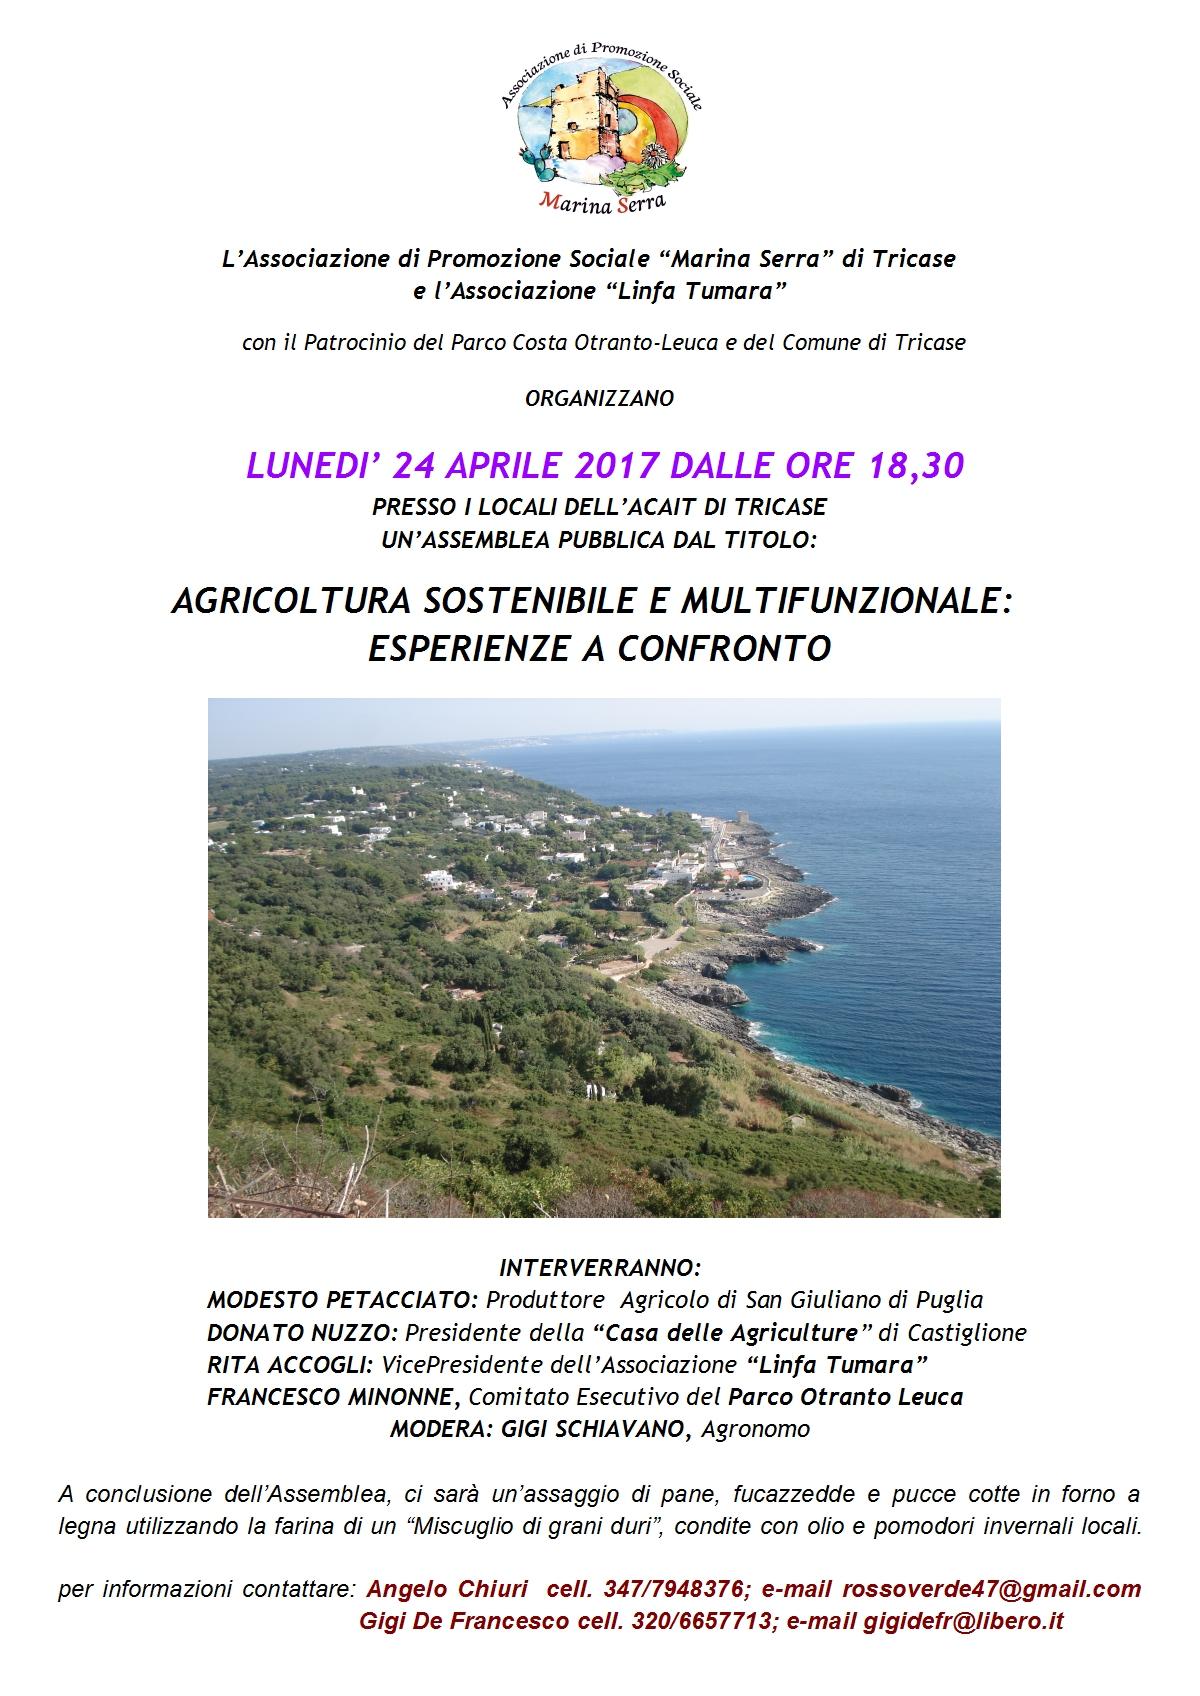 locandina-assemblea-acait-24-04-17